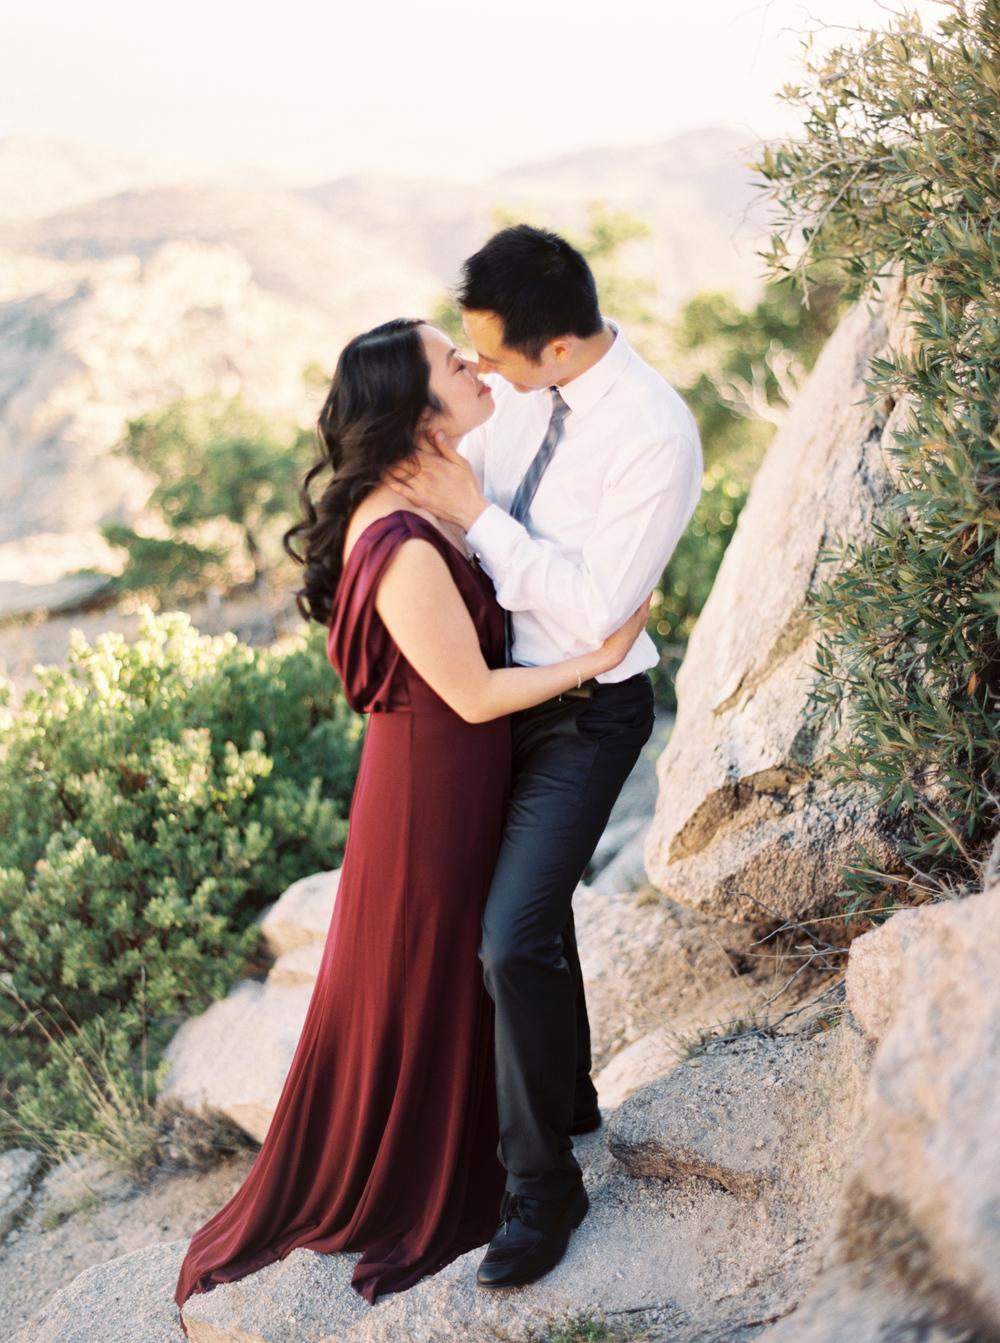 RomanticMountaintop-NicoleBerrett0003.JPG